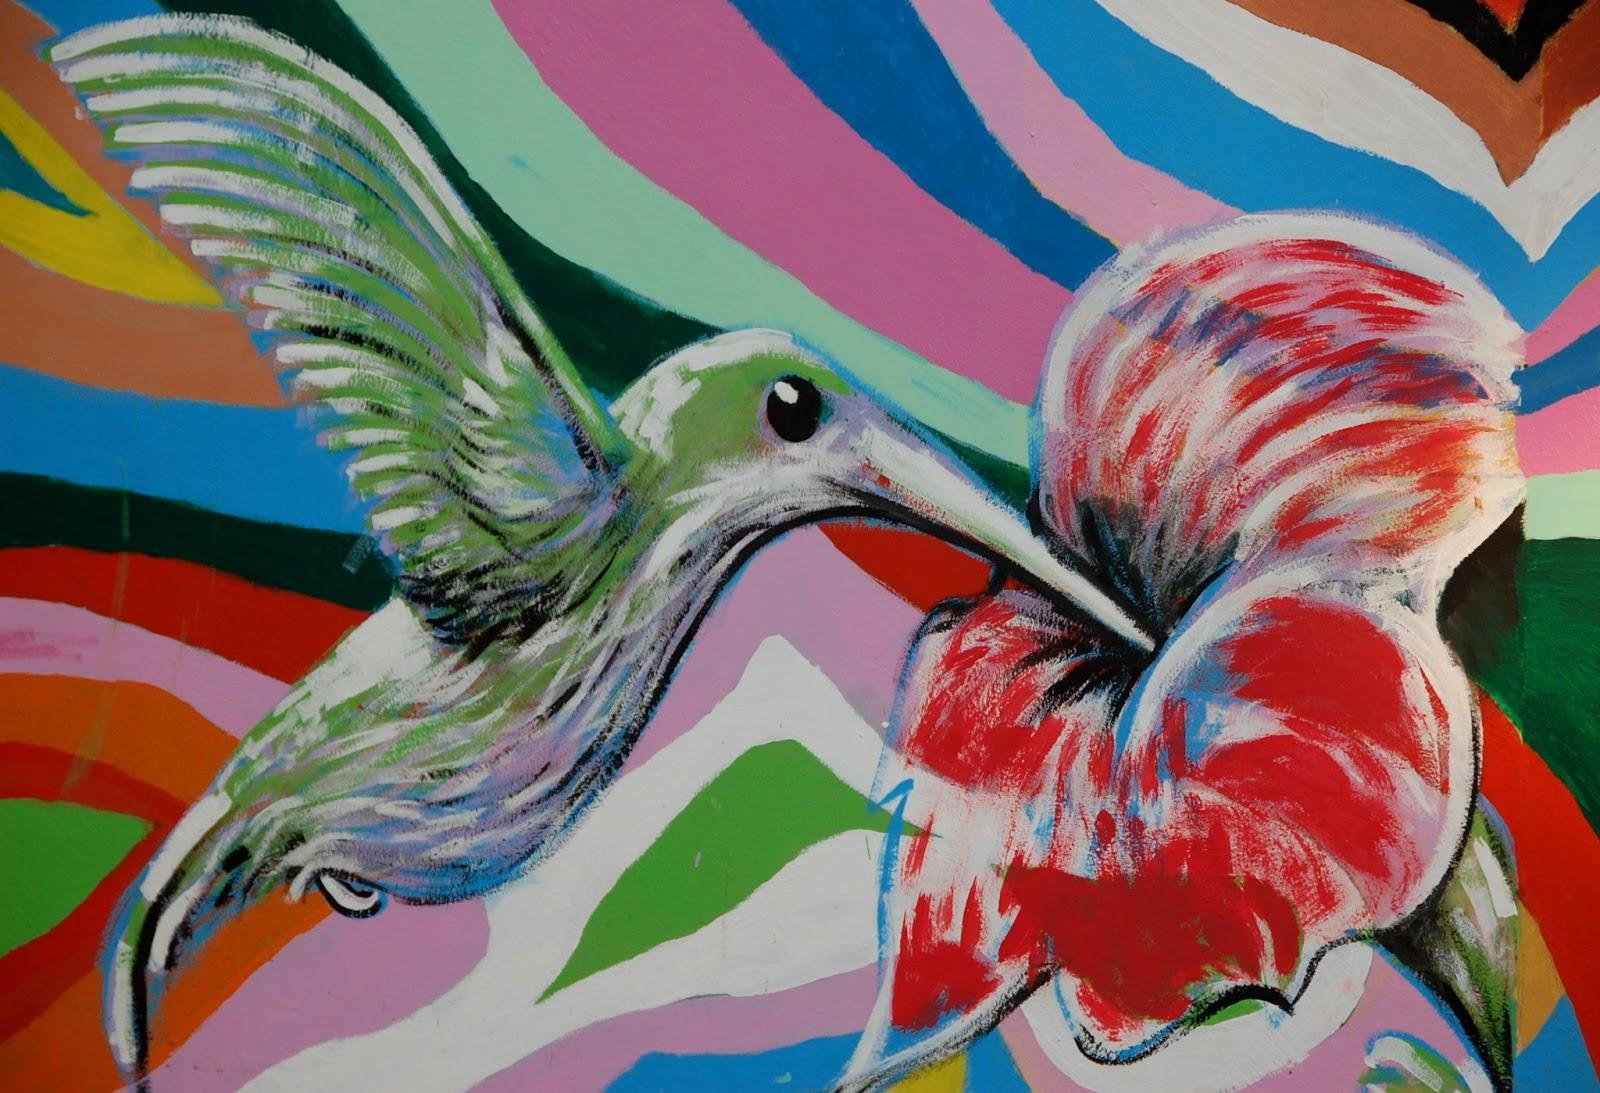 Javier espinal murales colectivos paso a paso sps for Arte colectivo mural